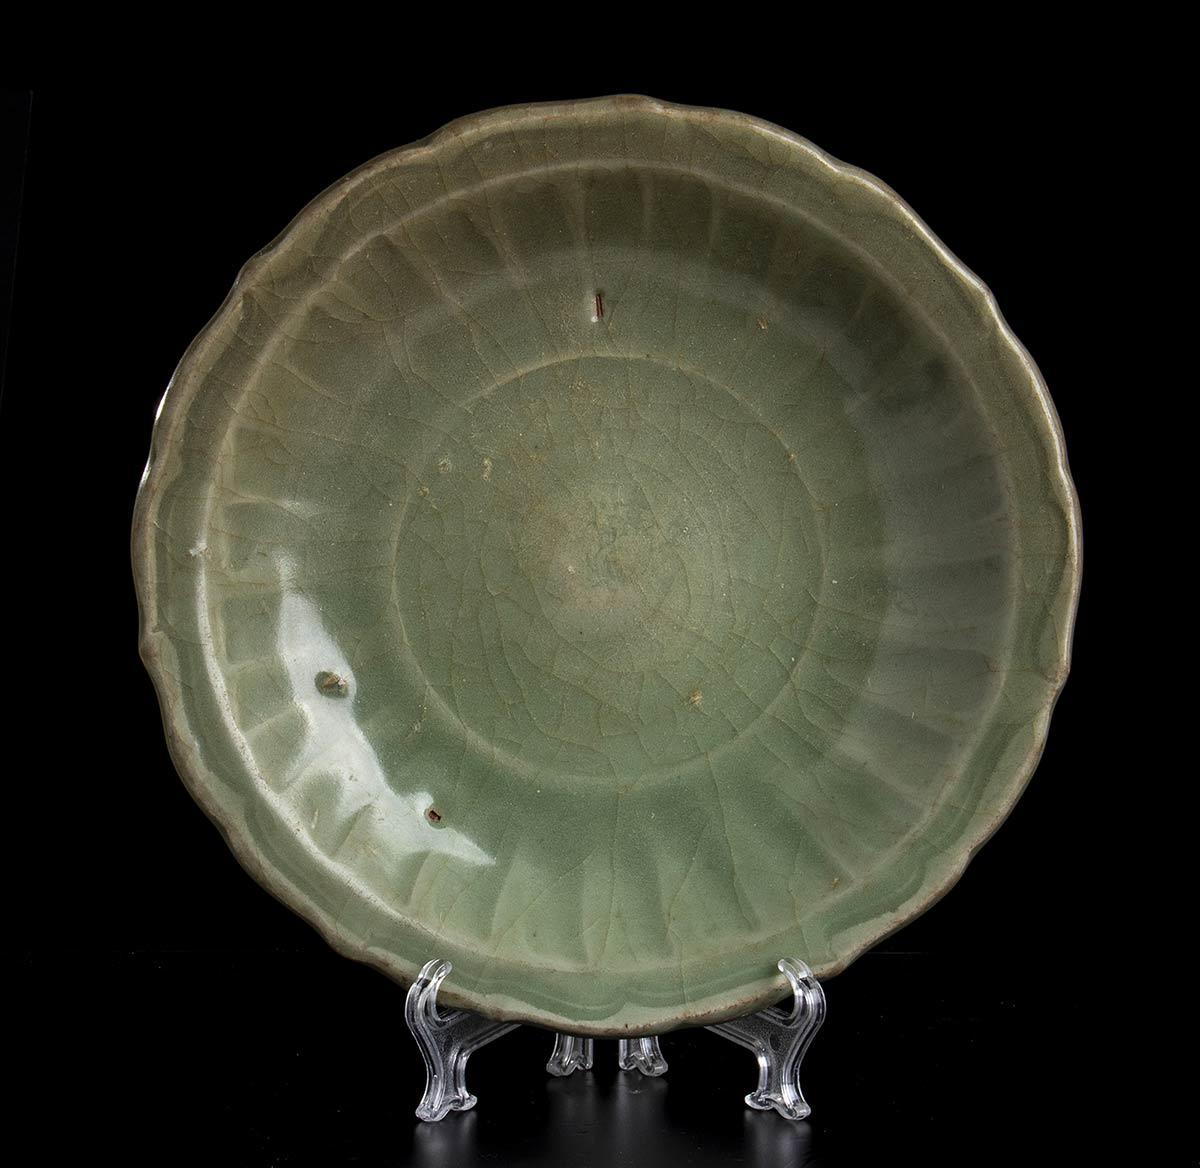 A CÉLADON GLAZED LONGQUAN CERAMIC DISHChina, early Ming dynasty